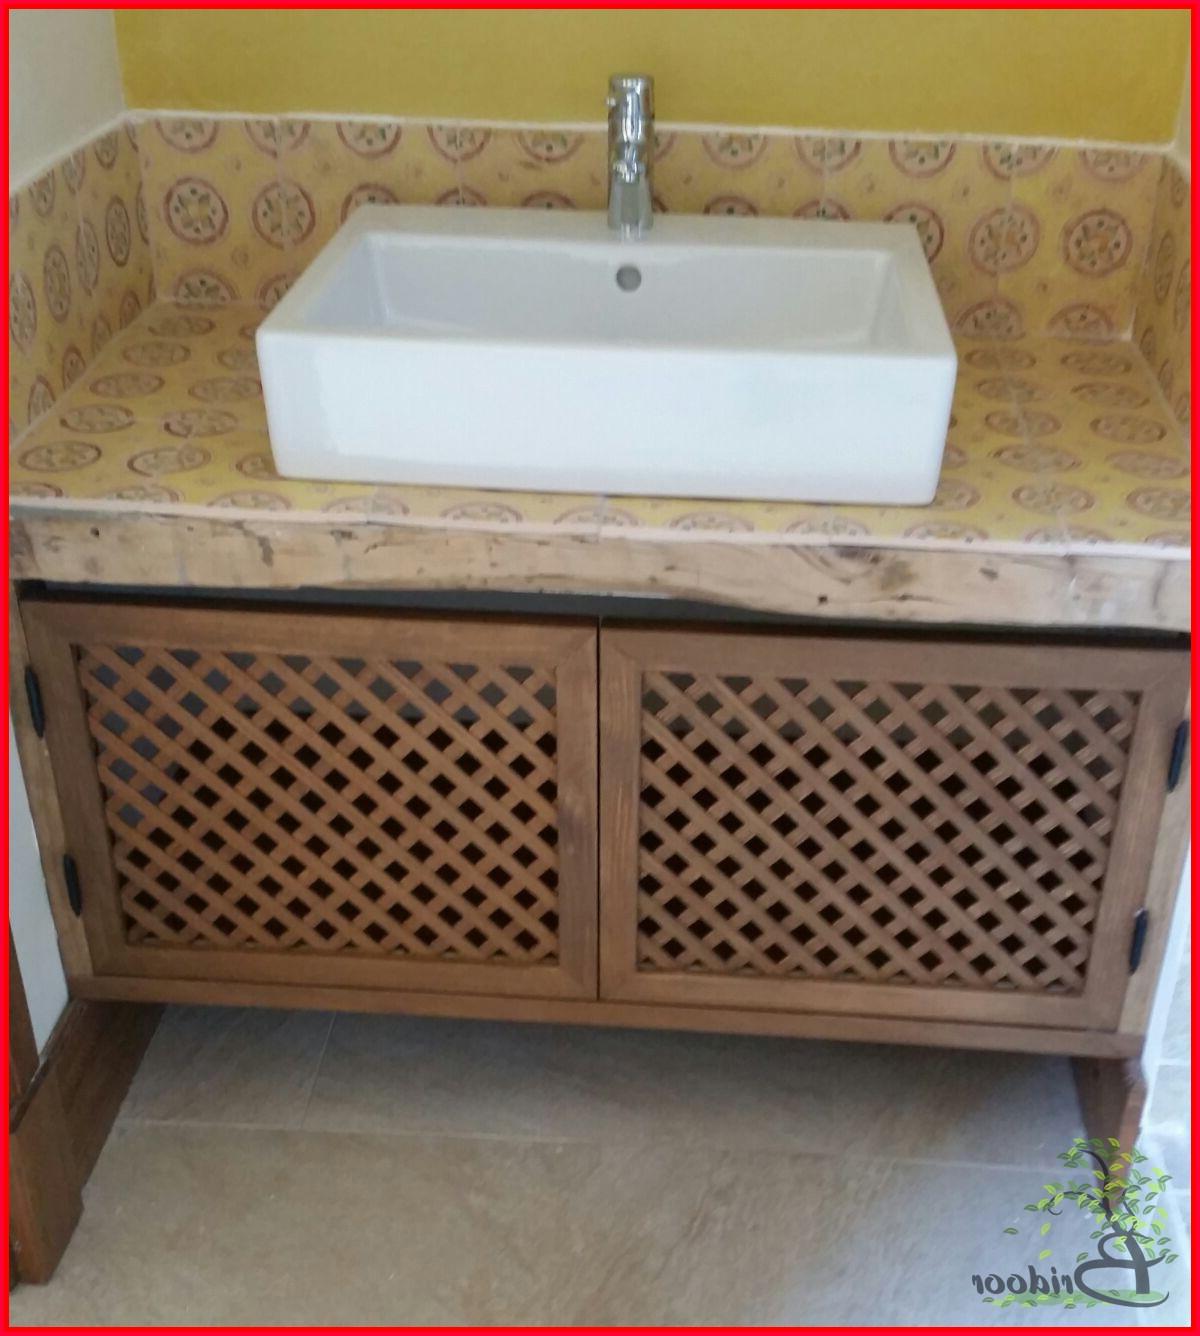 Muebles De Baño Madera 9fdy Muebles De Baà O Rusticos Muebles De BaO Rustico Muebles Para